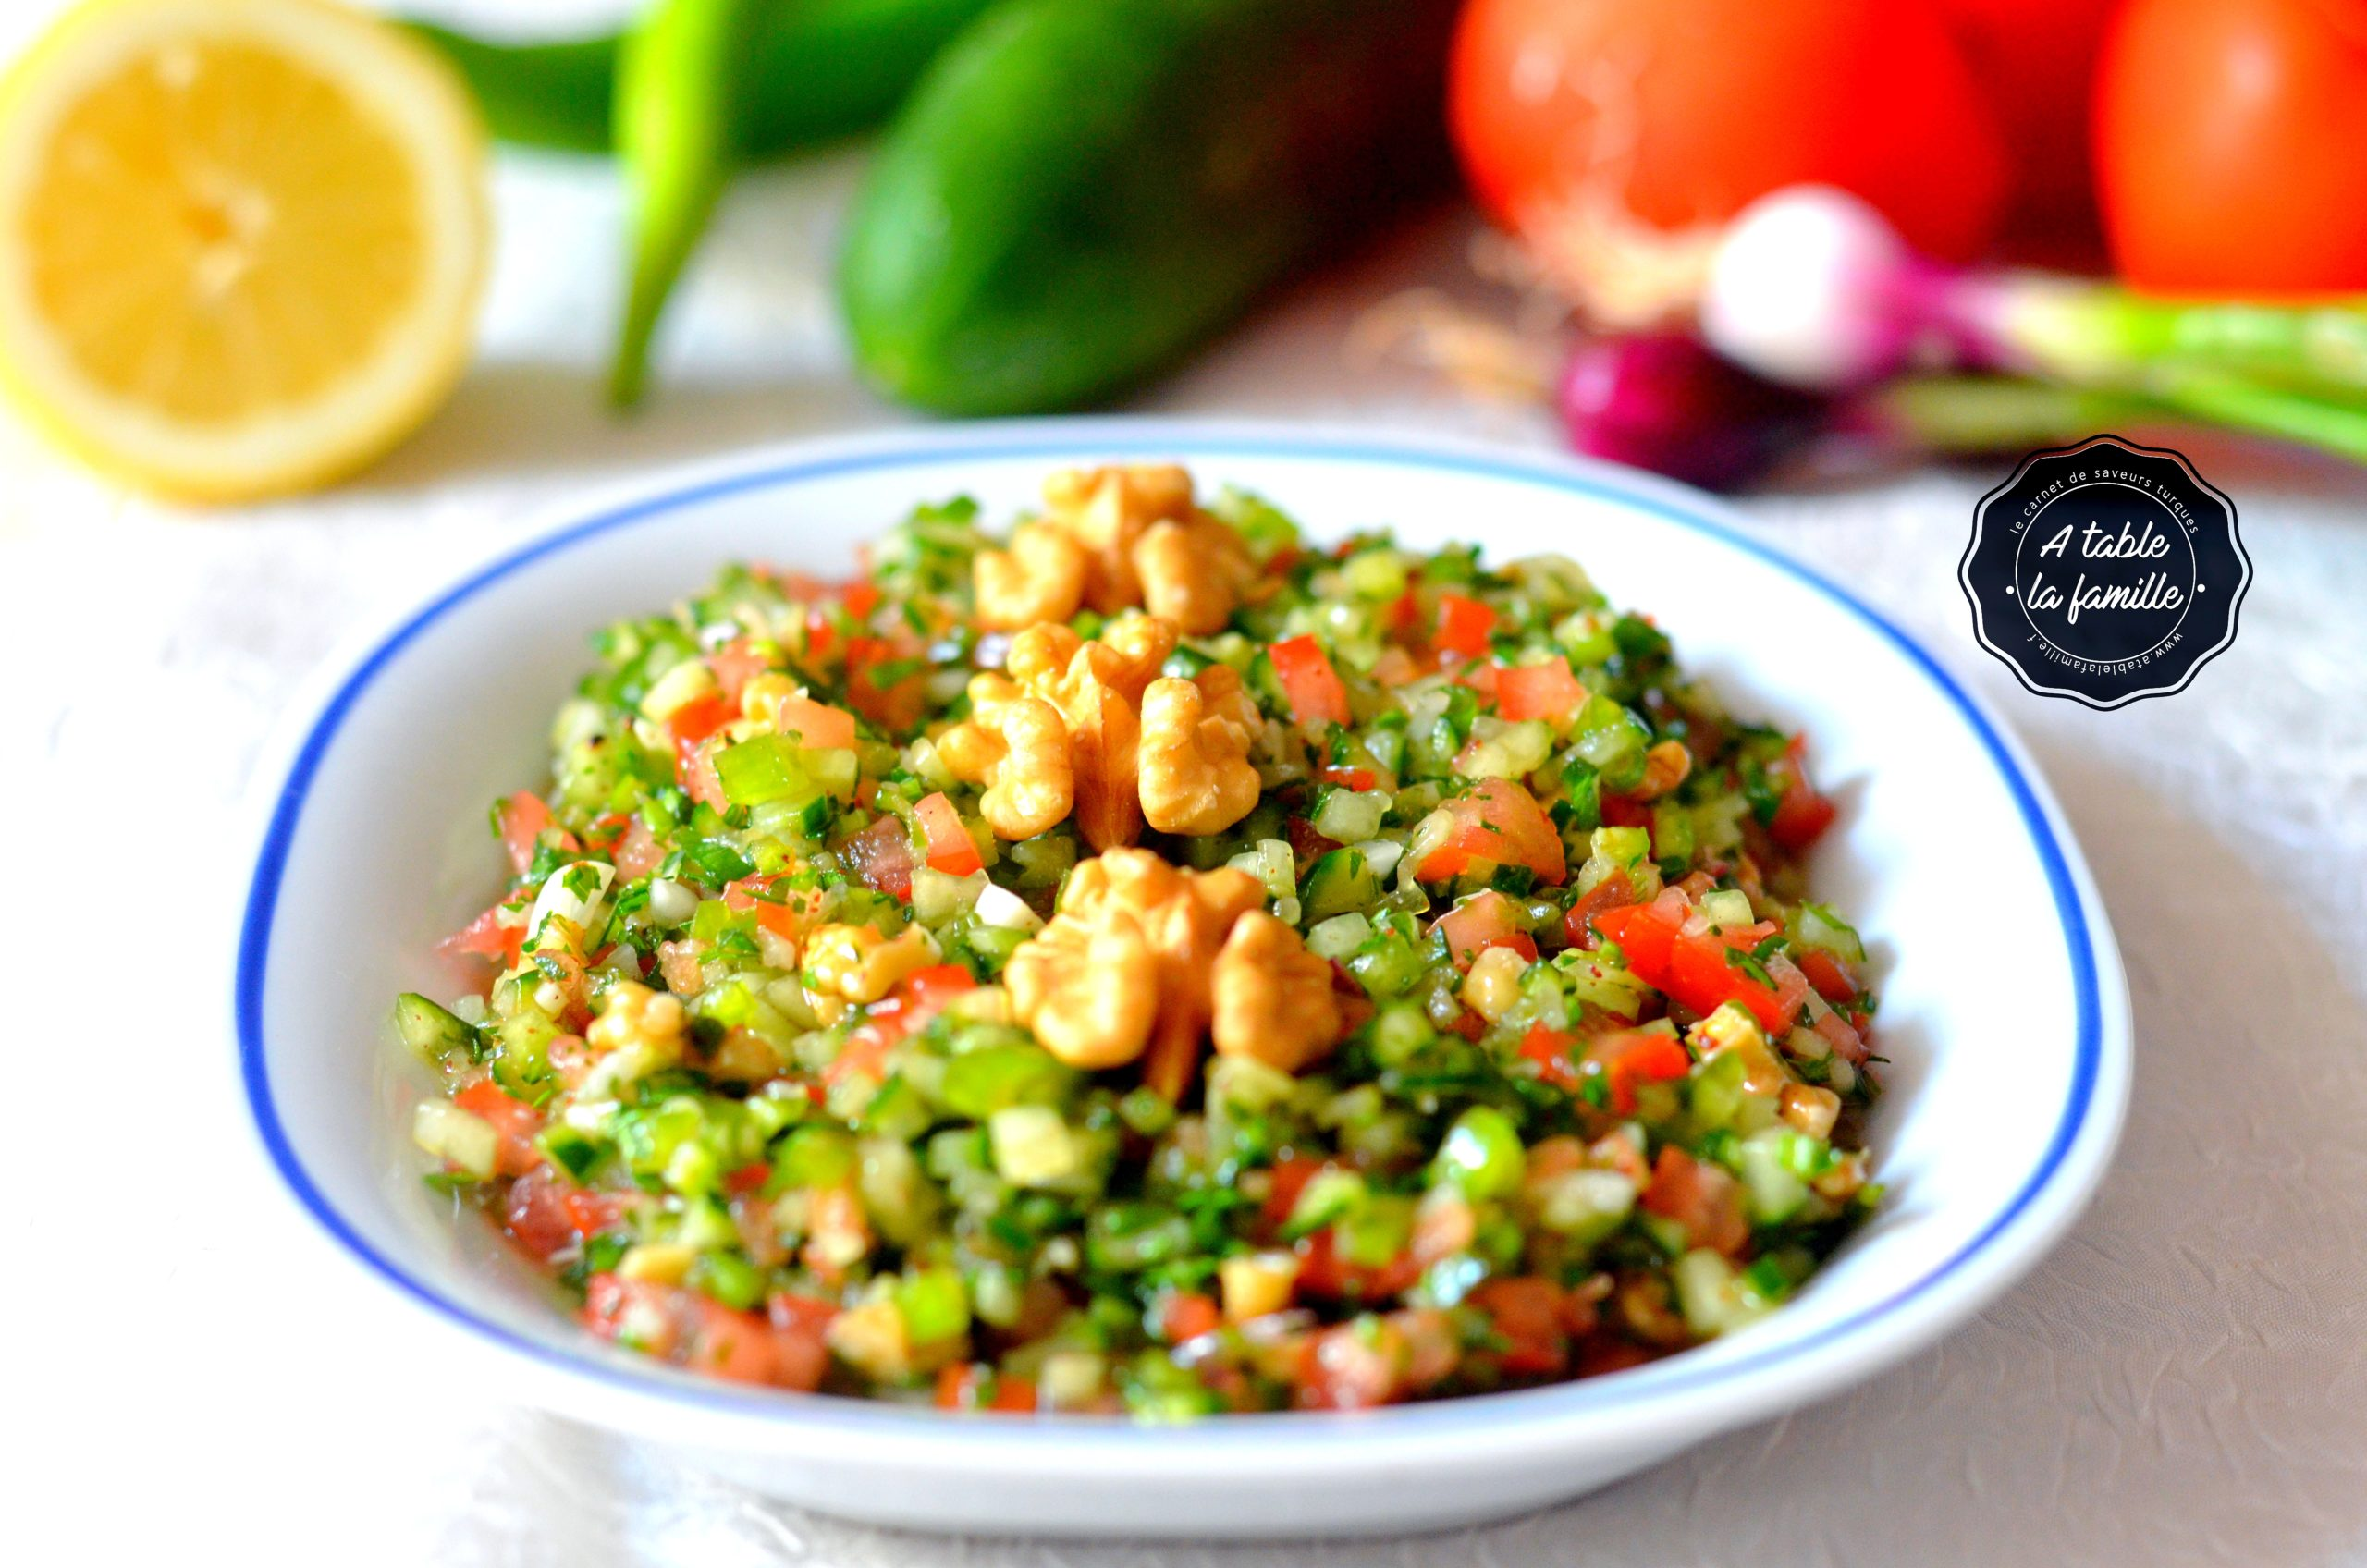 Mezze gavurdagi salatasi